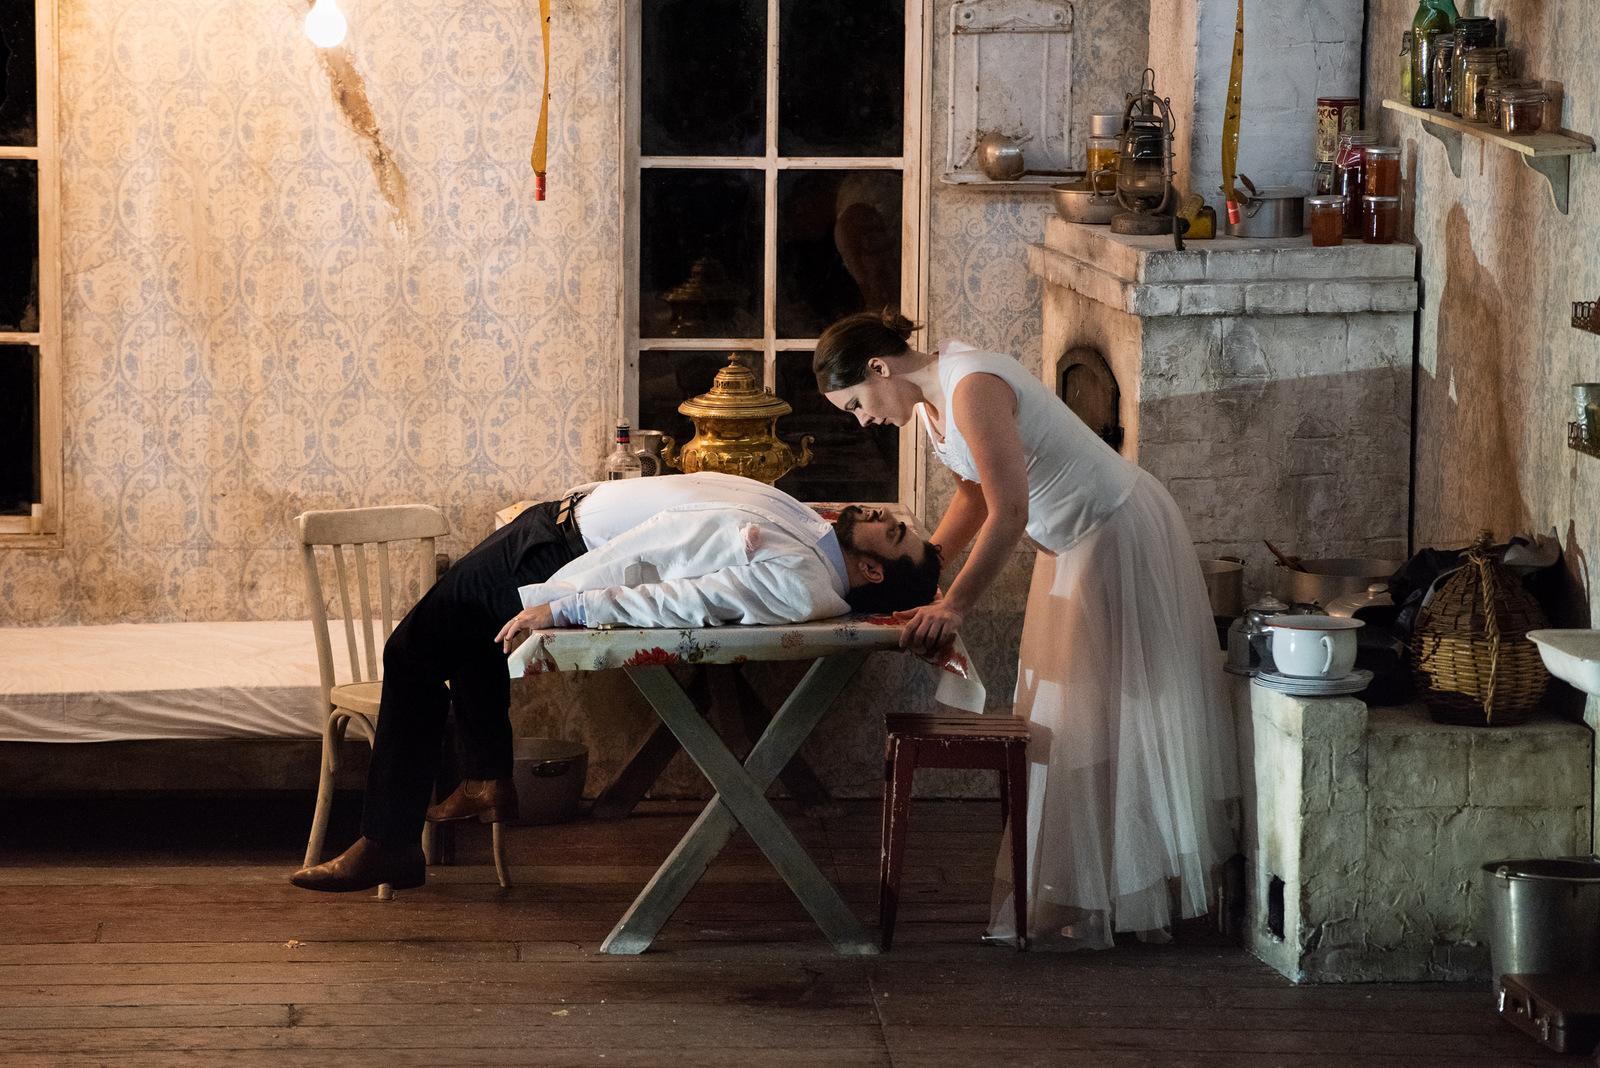 L'Enchanteresse, de Tchaïkovski – Mise en scène Andriy Zholdak © Stofleth